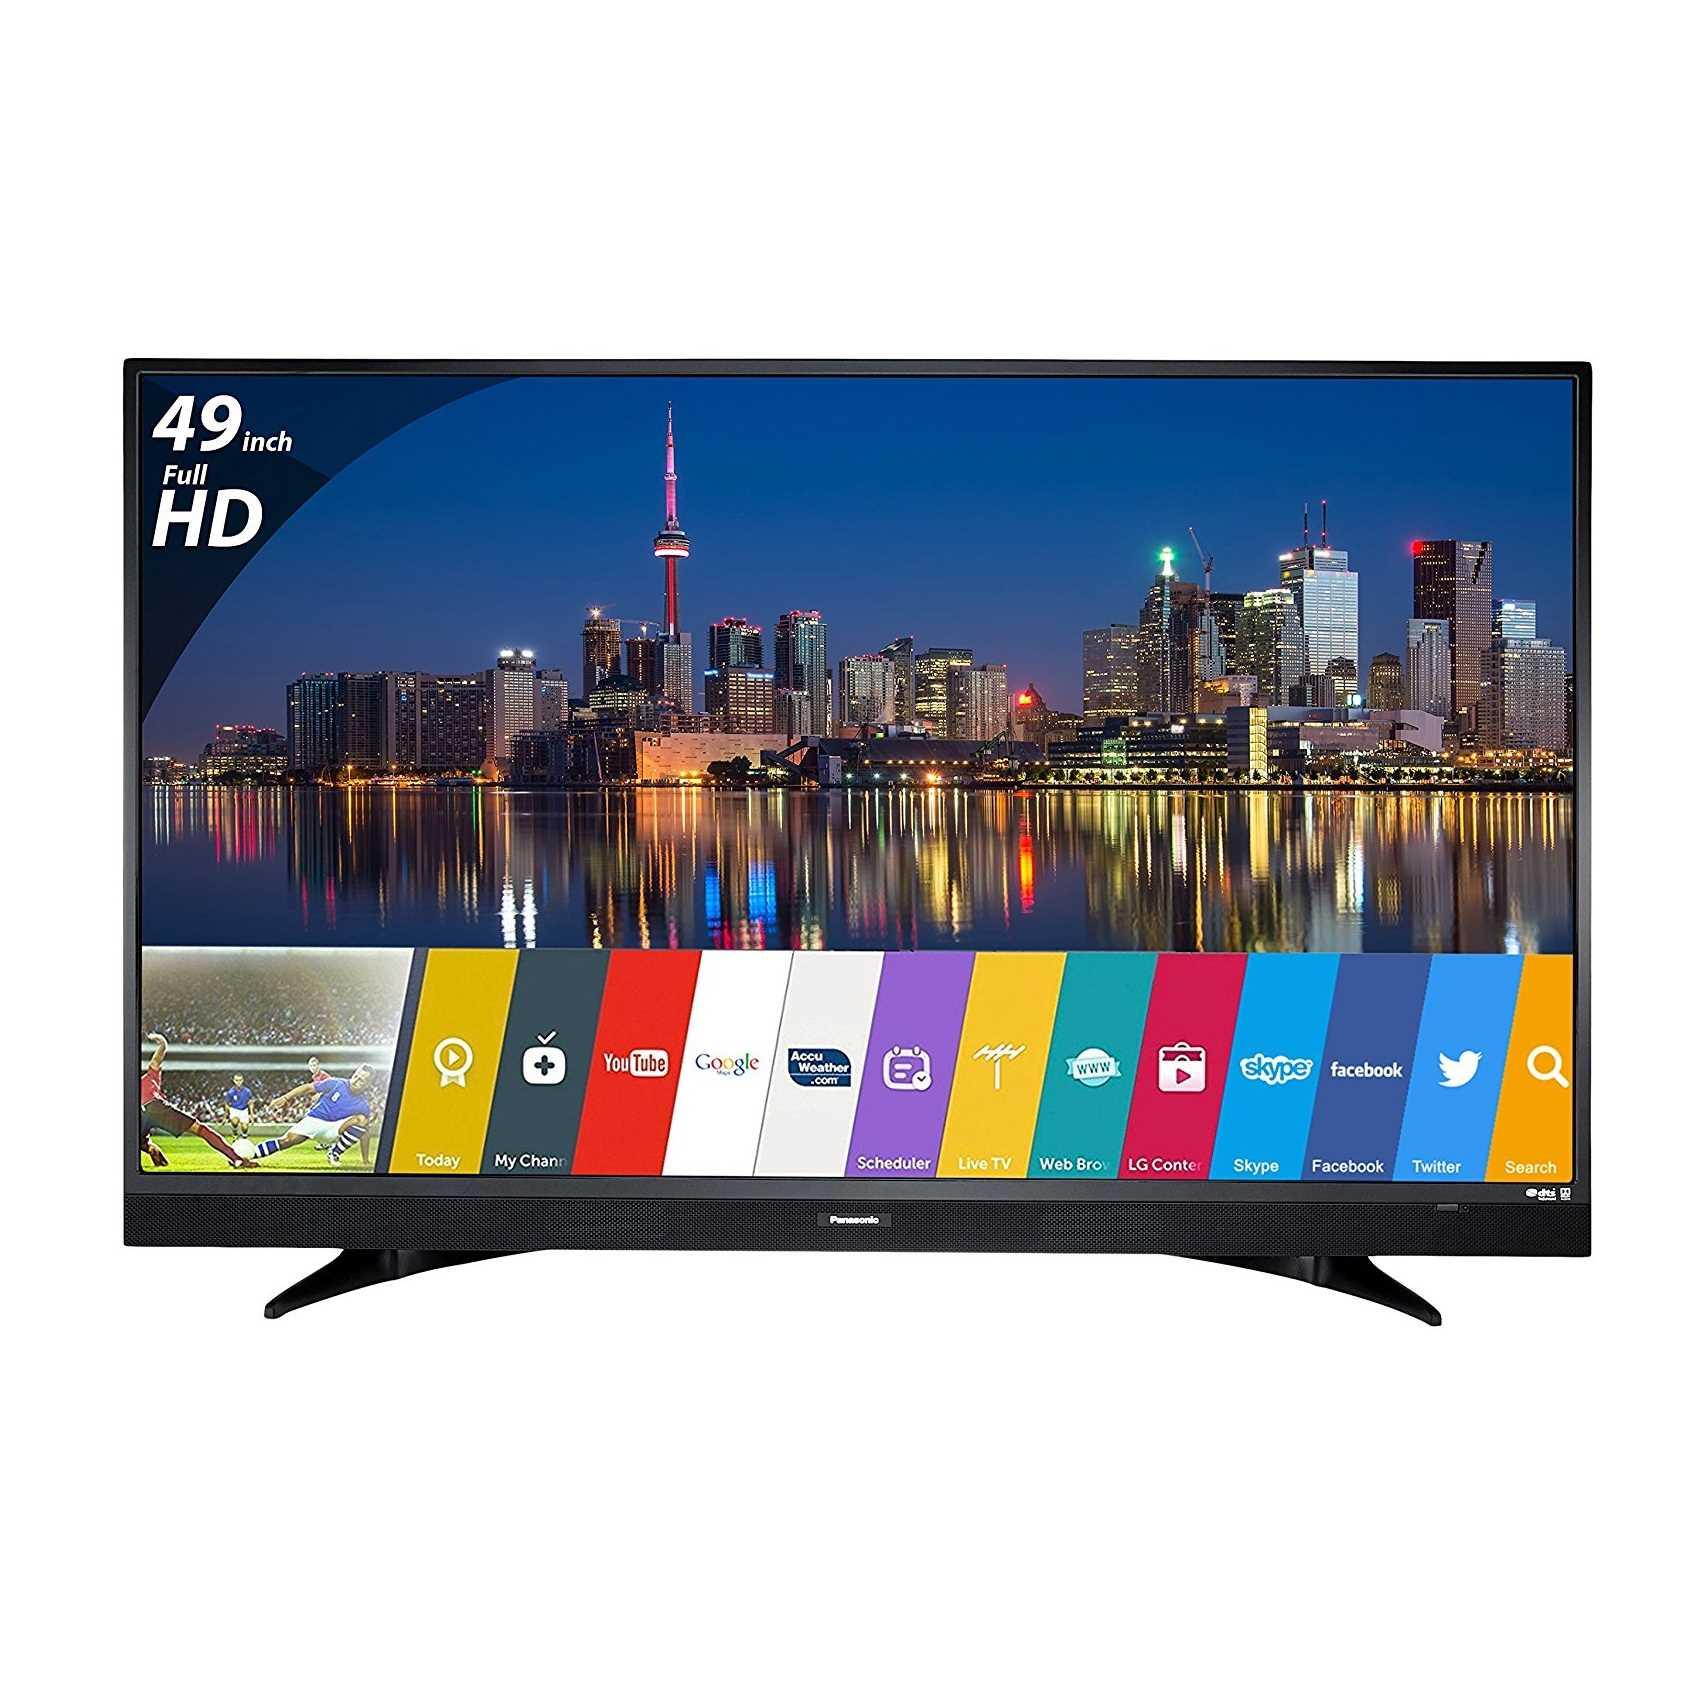 Panasonic Viera TH-W49ES48DX 49 Inch Full HD Smart LED Television